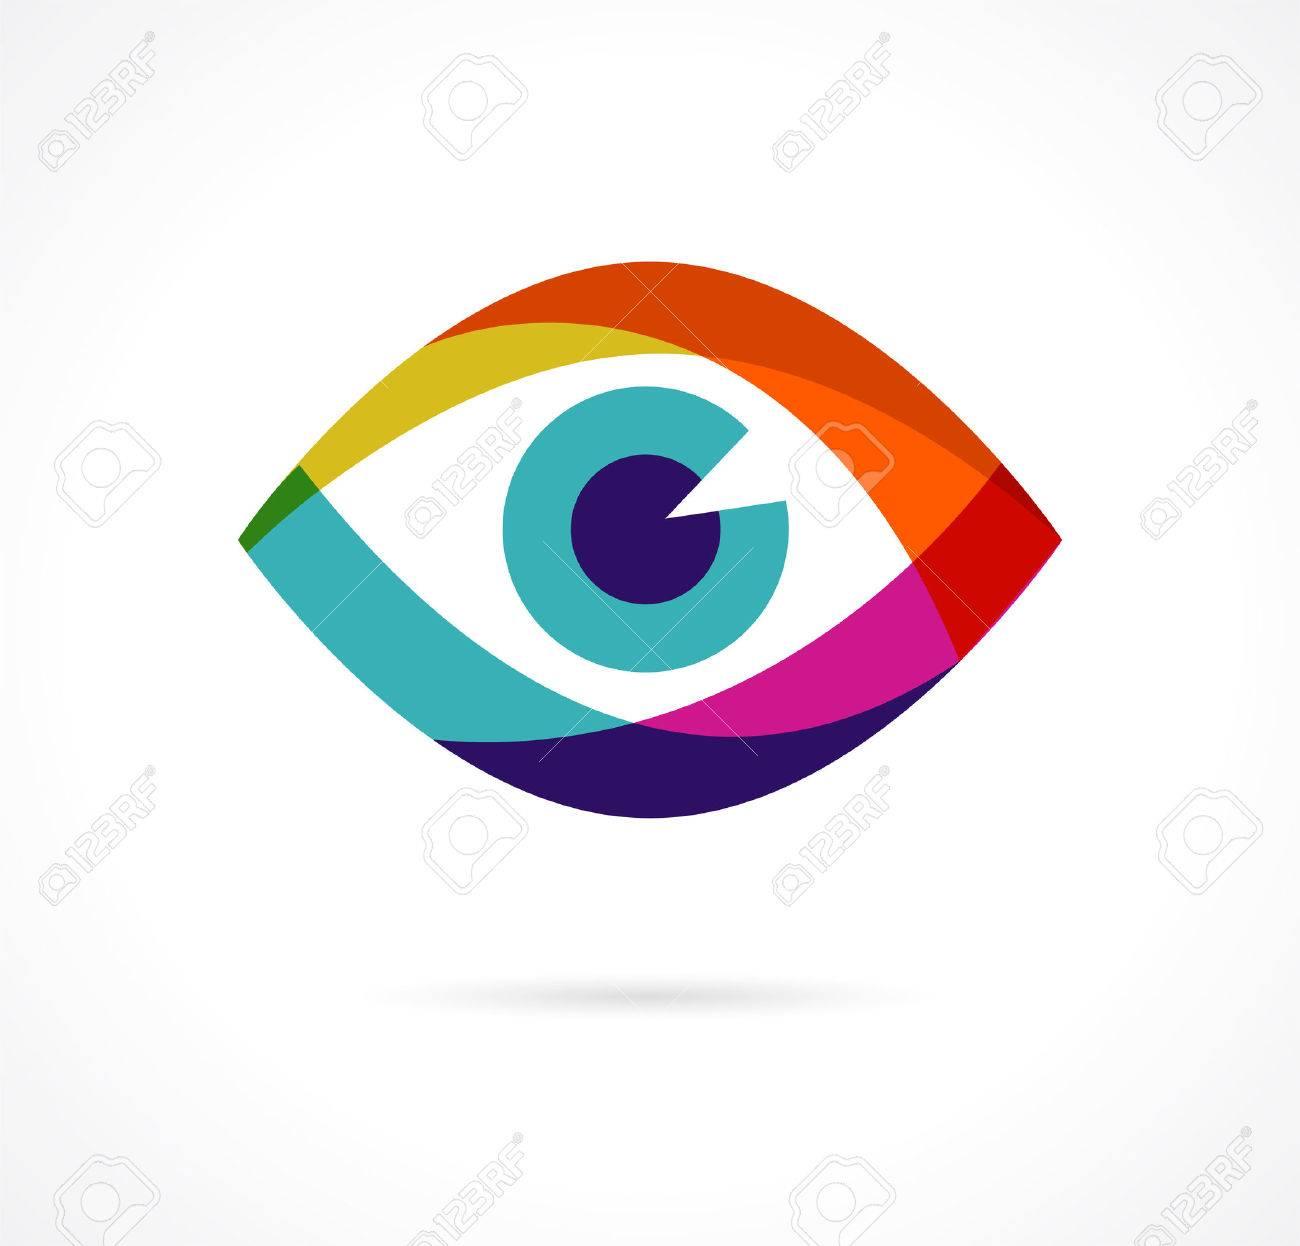 Set of colorful eye icons - 41200956